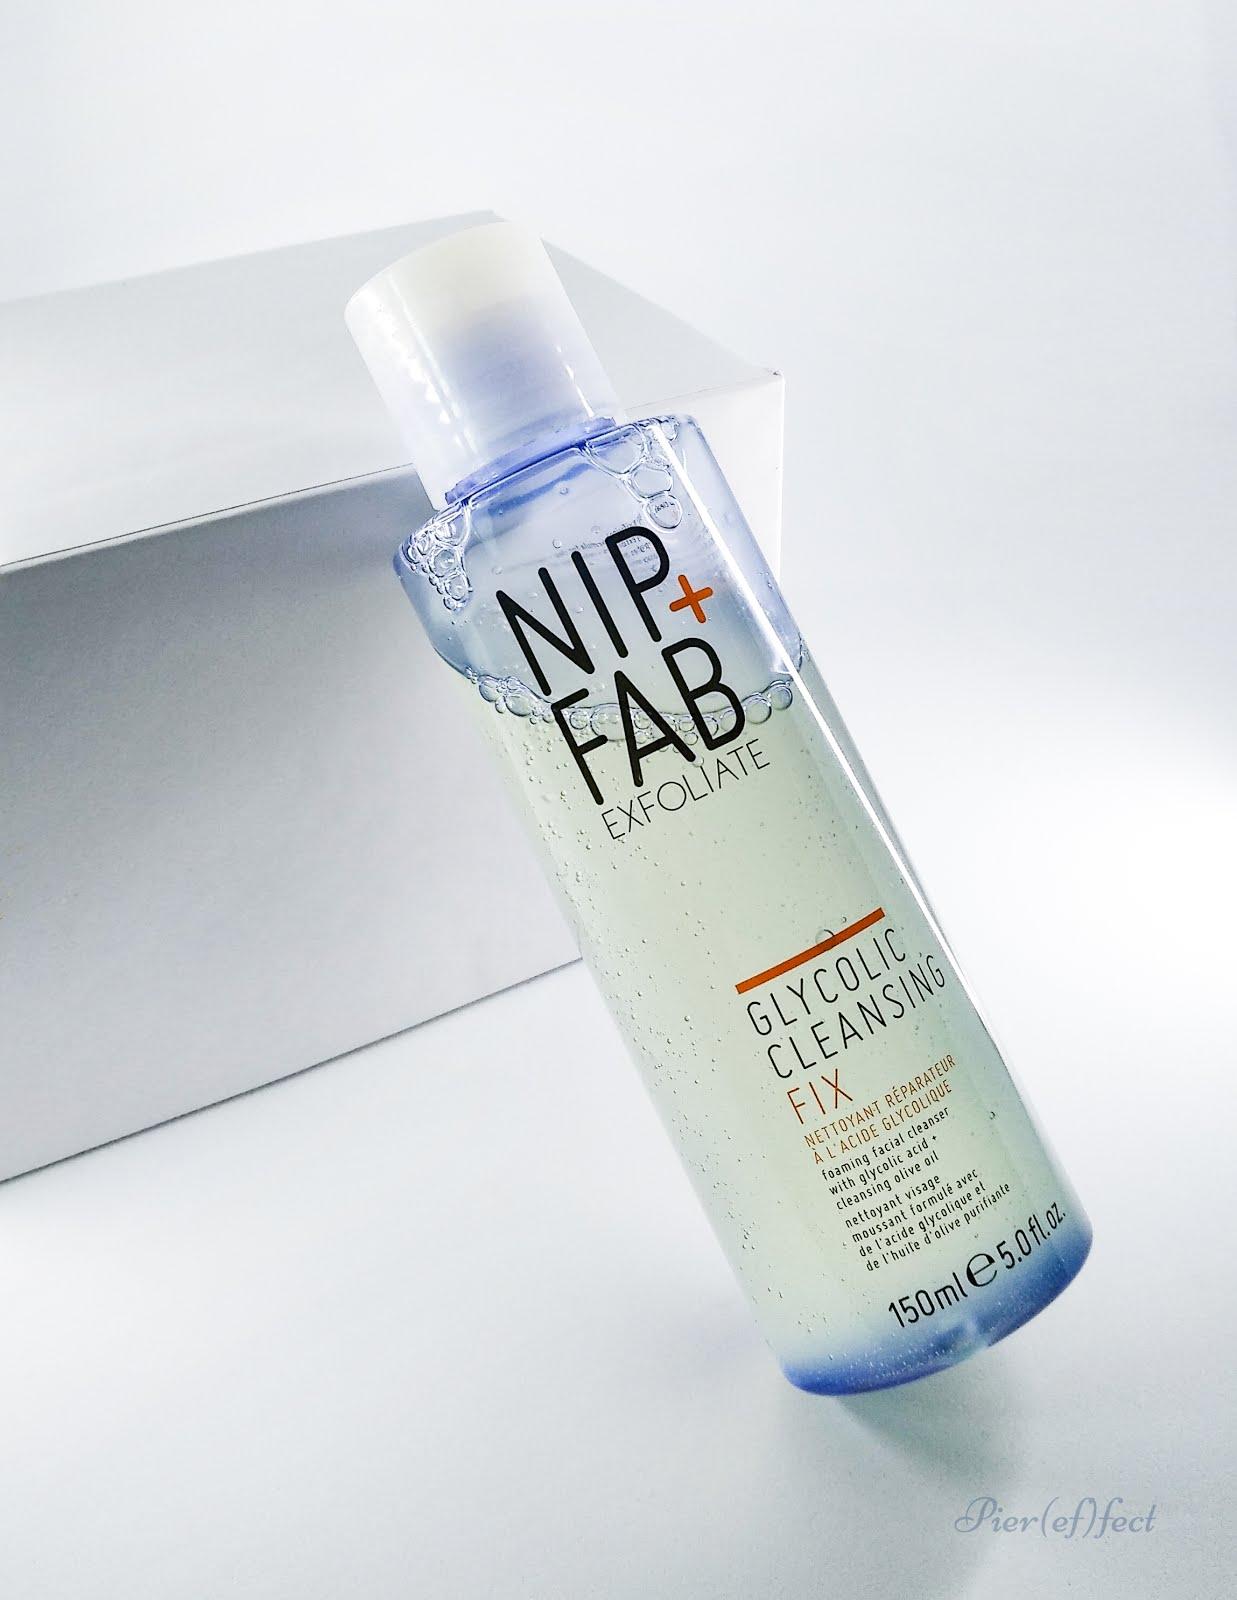 Nip+Fab Glycol Cleansing Fix